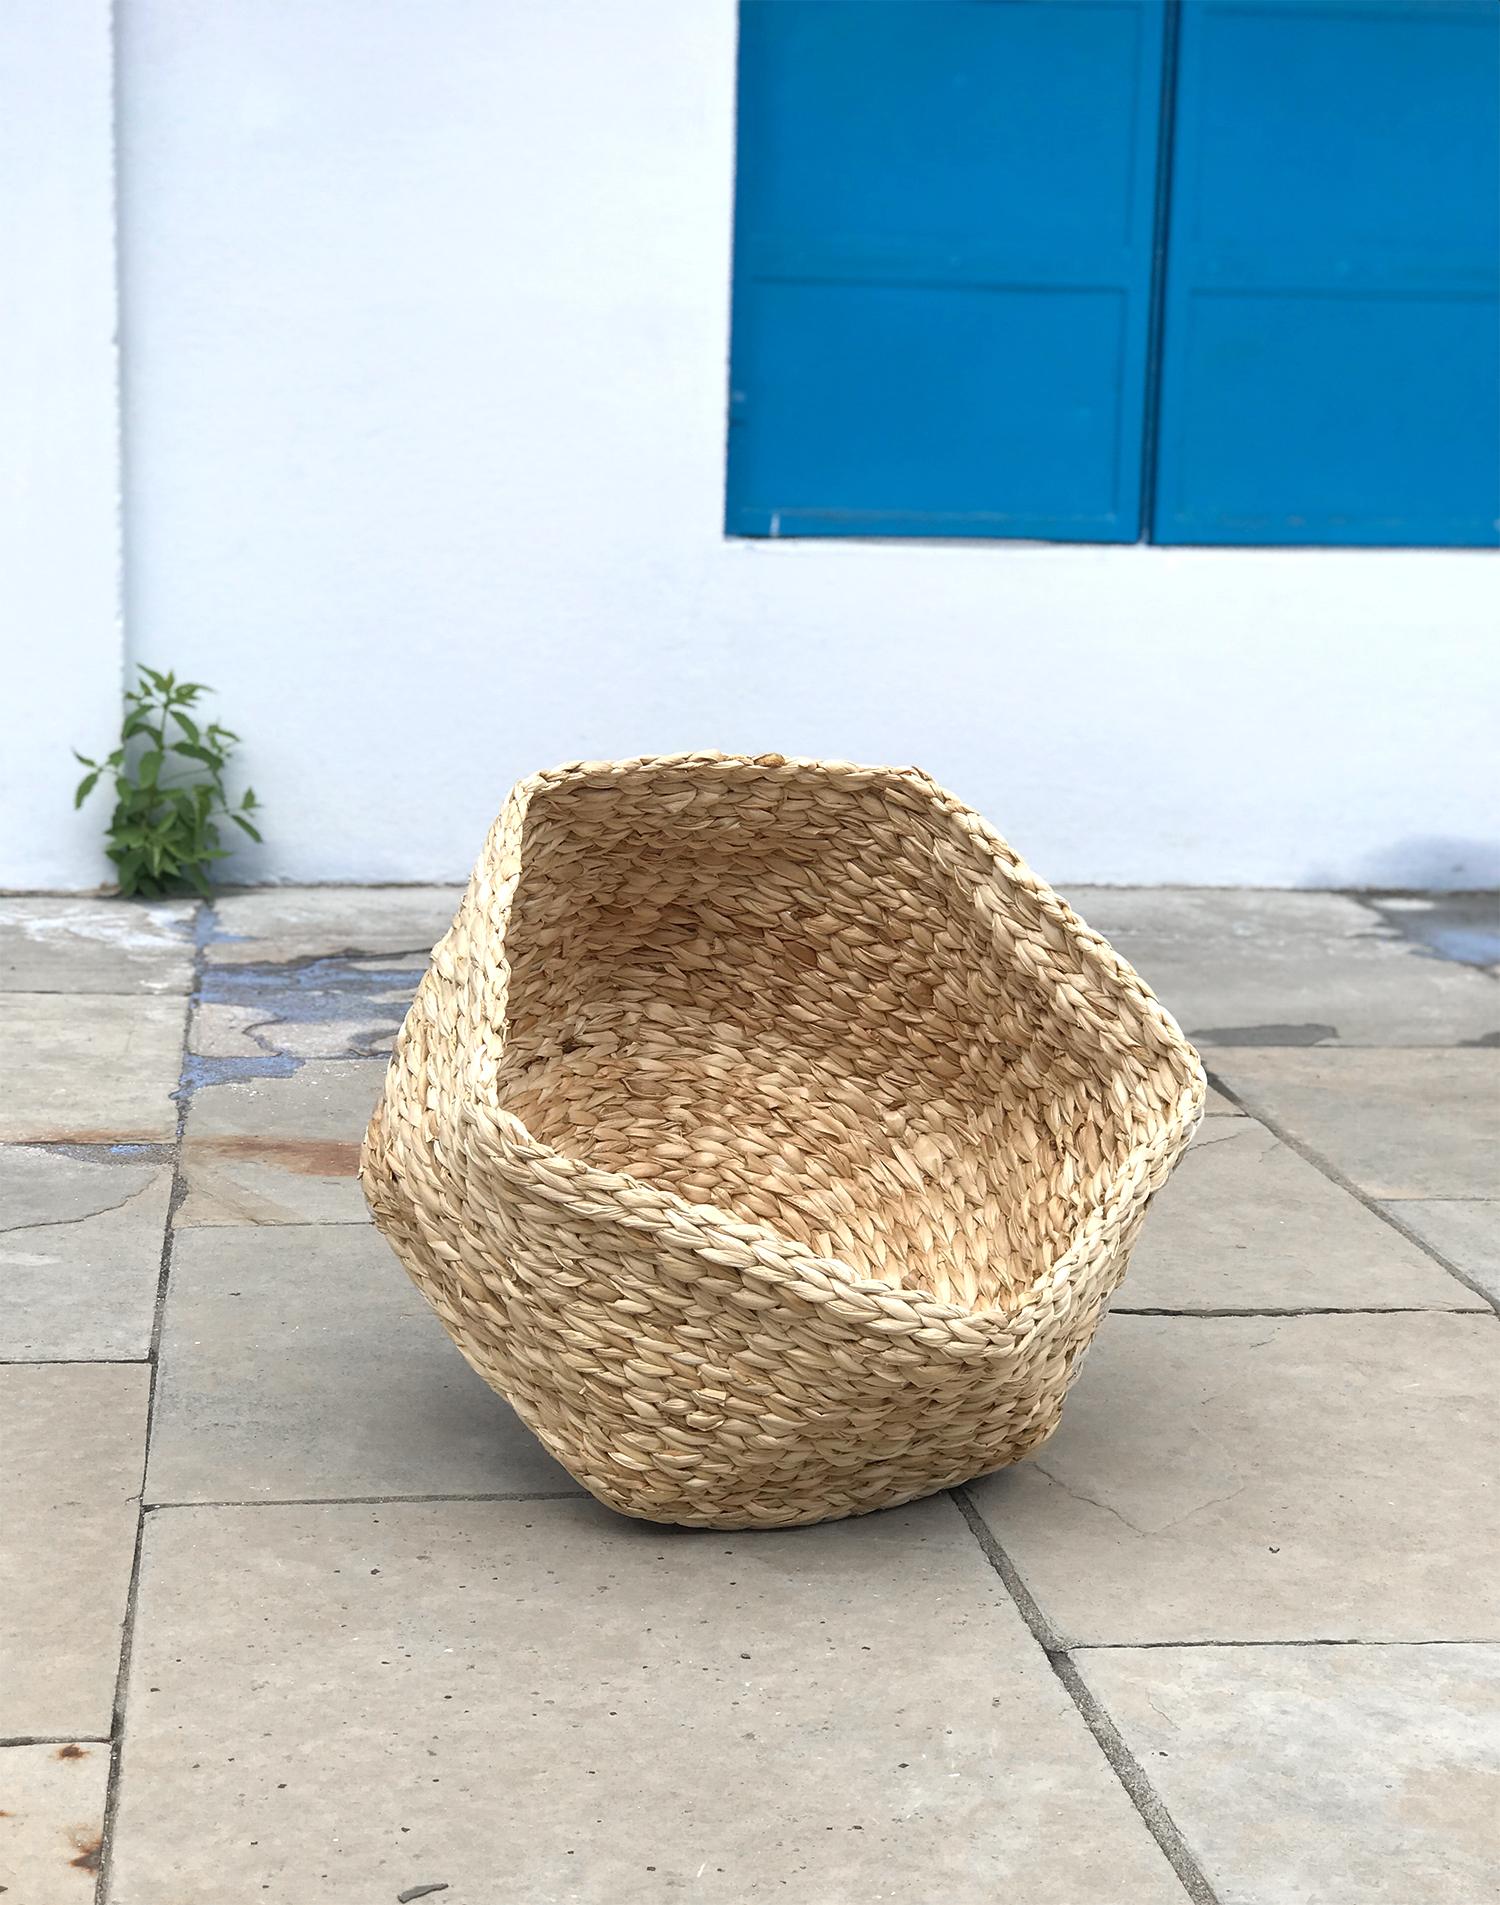 Step 4: The prototype of the polygon basket made of banana bark.